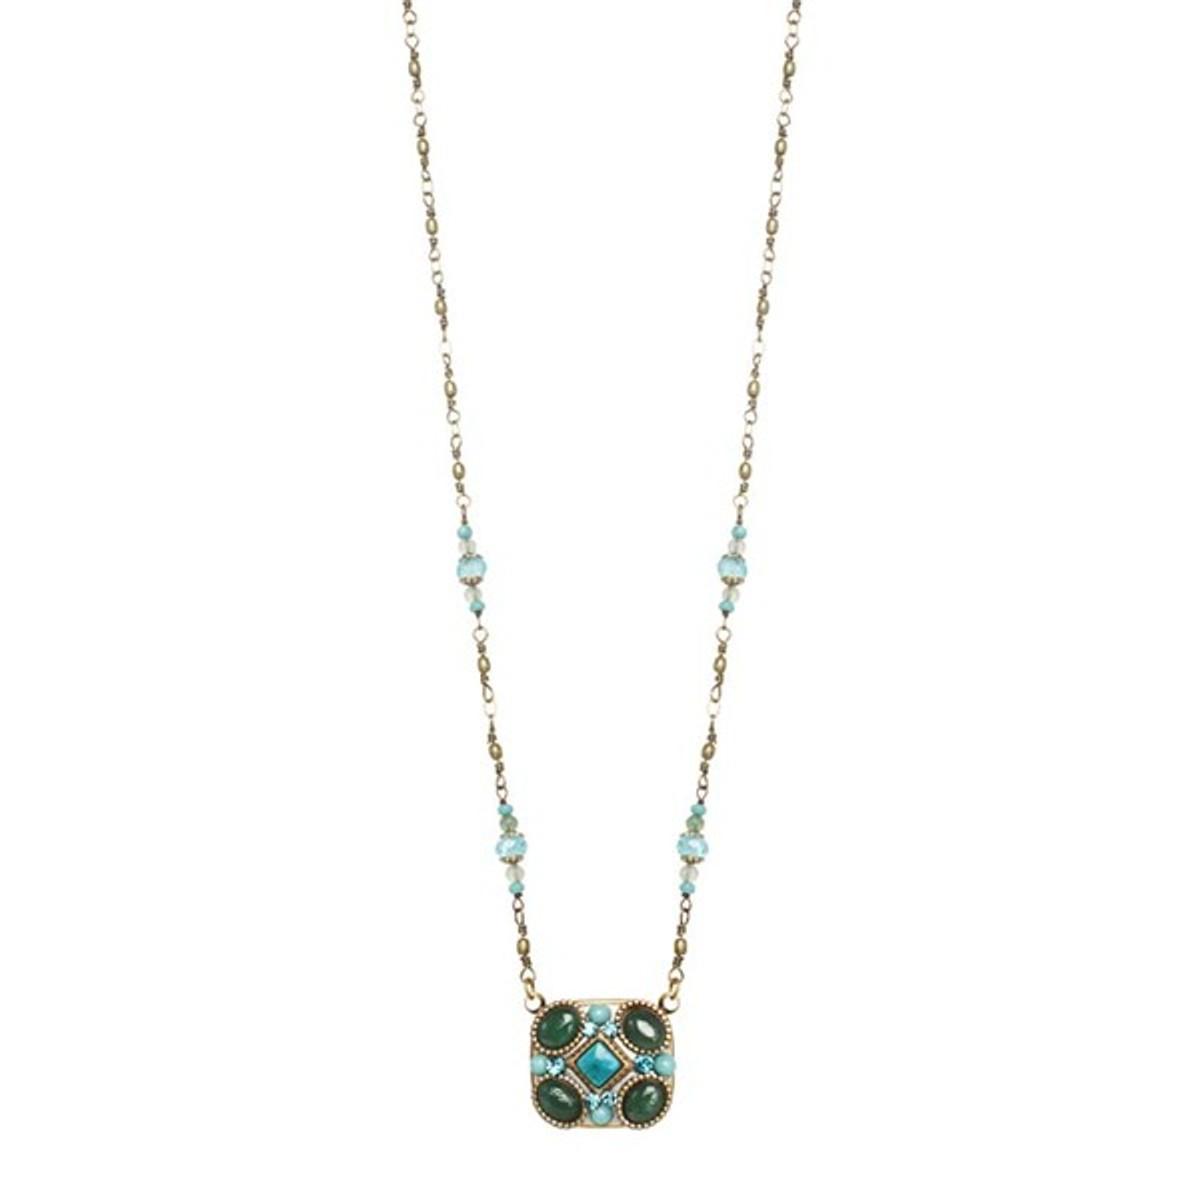 Turquoise Golan Jewelry Nile Necklace